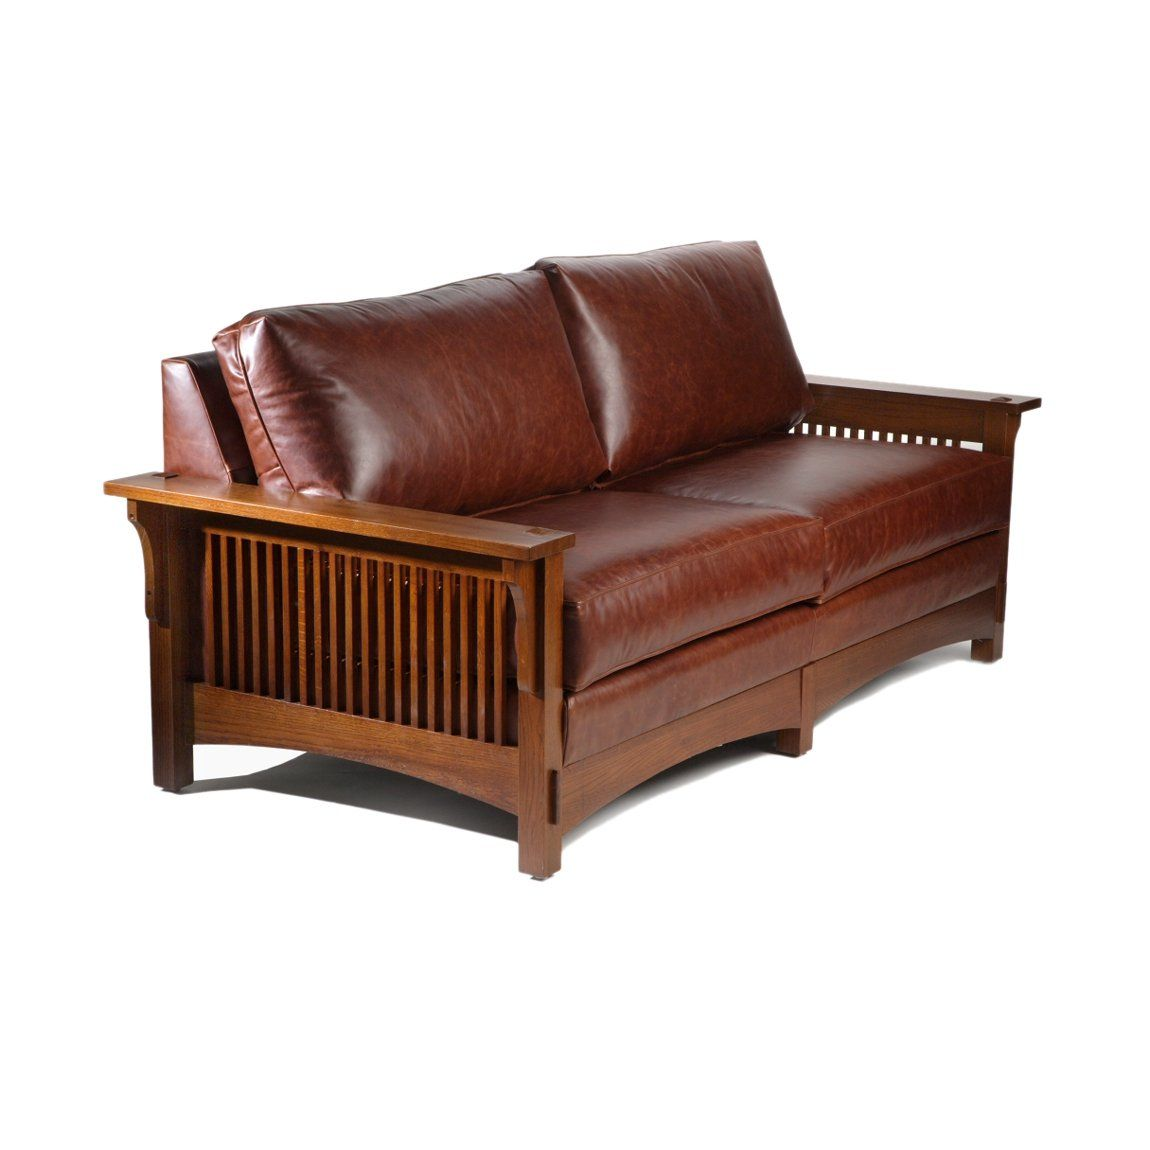 Brilliant Arts Crafts 9602 Mission Loveseat Atg Stores 2337 Free Uwap Interior Chair Design Uwaporg